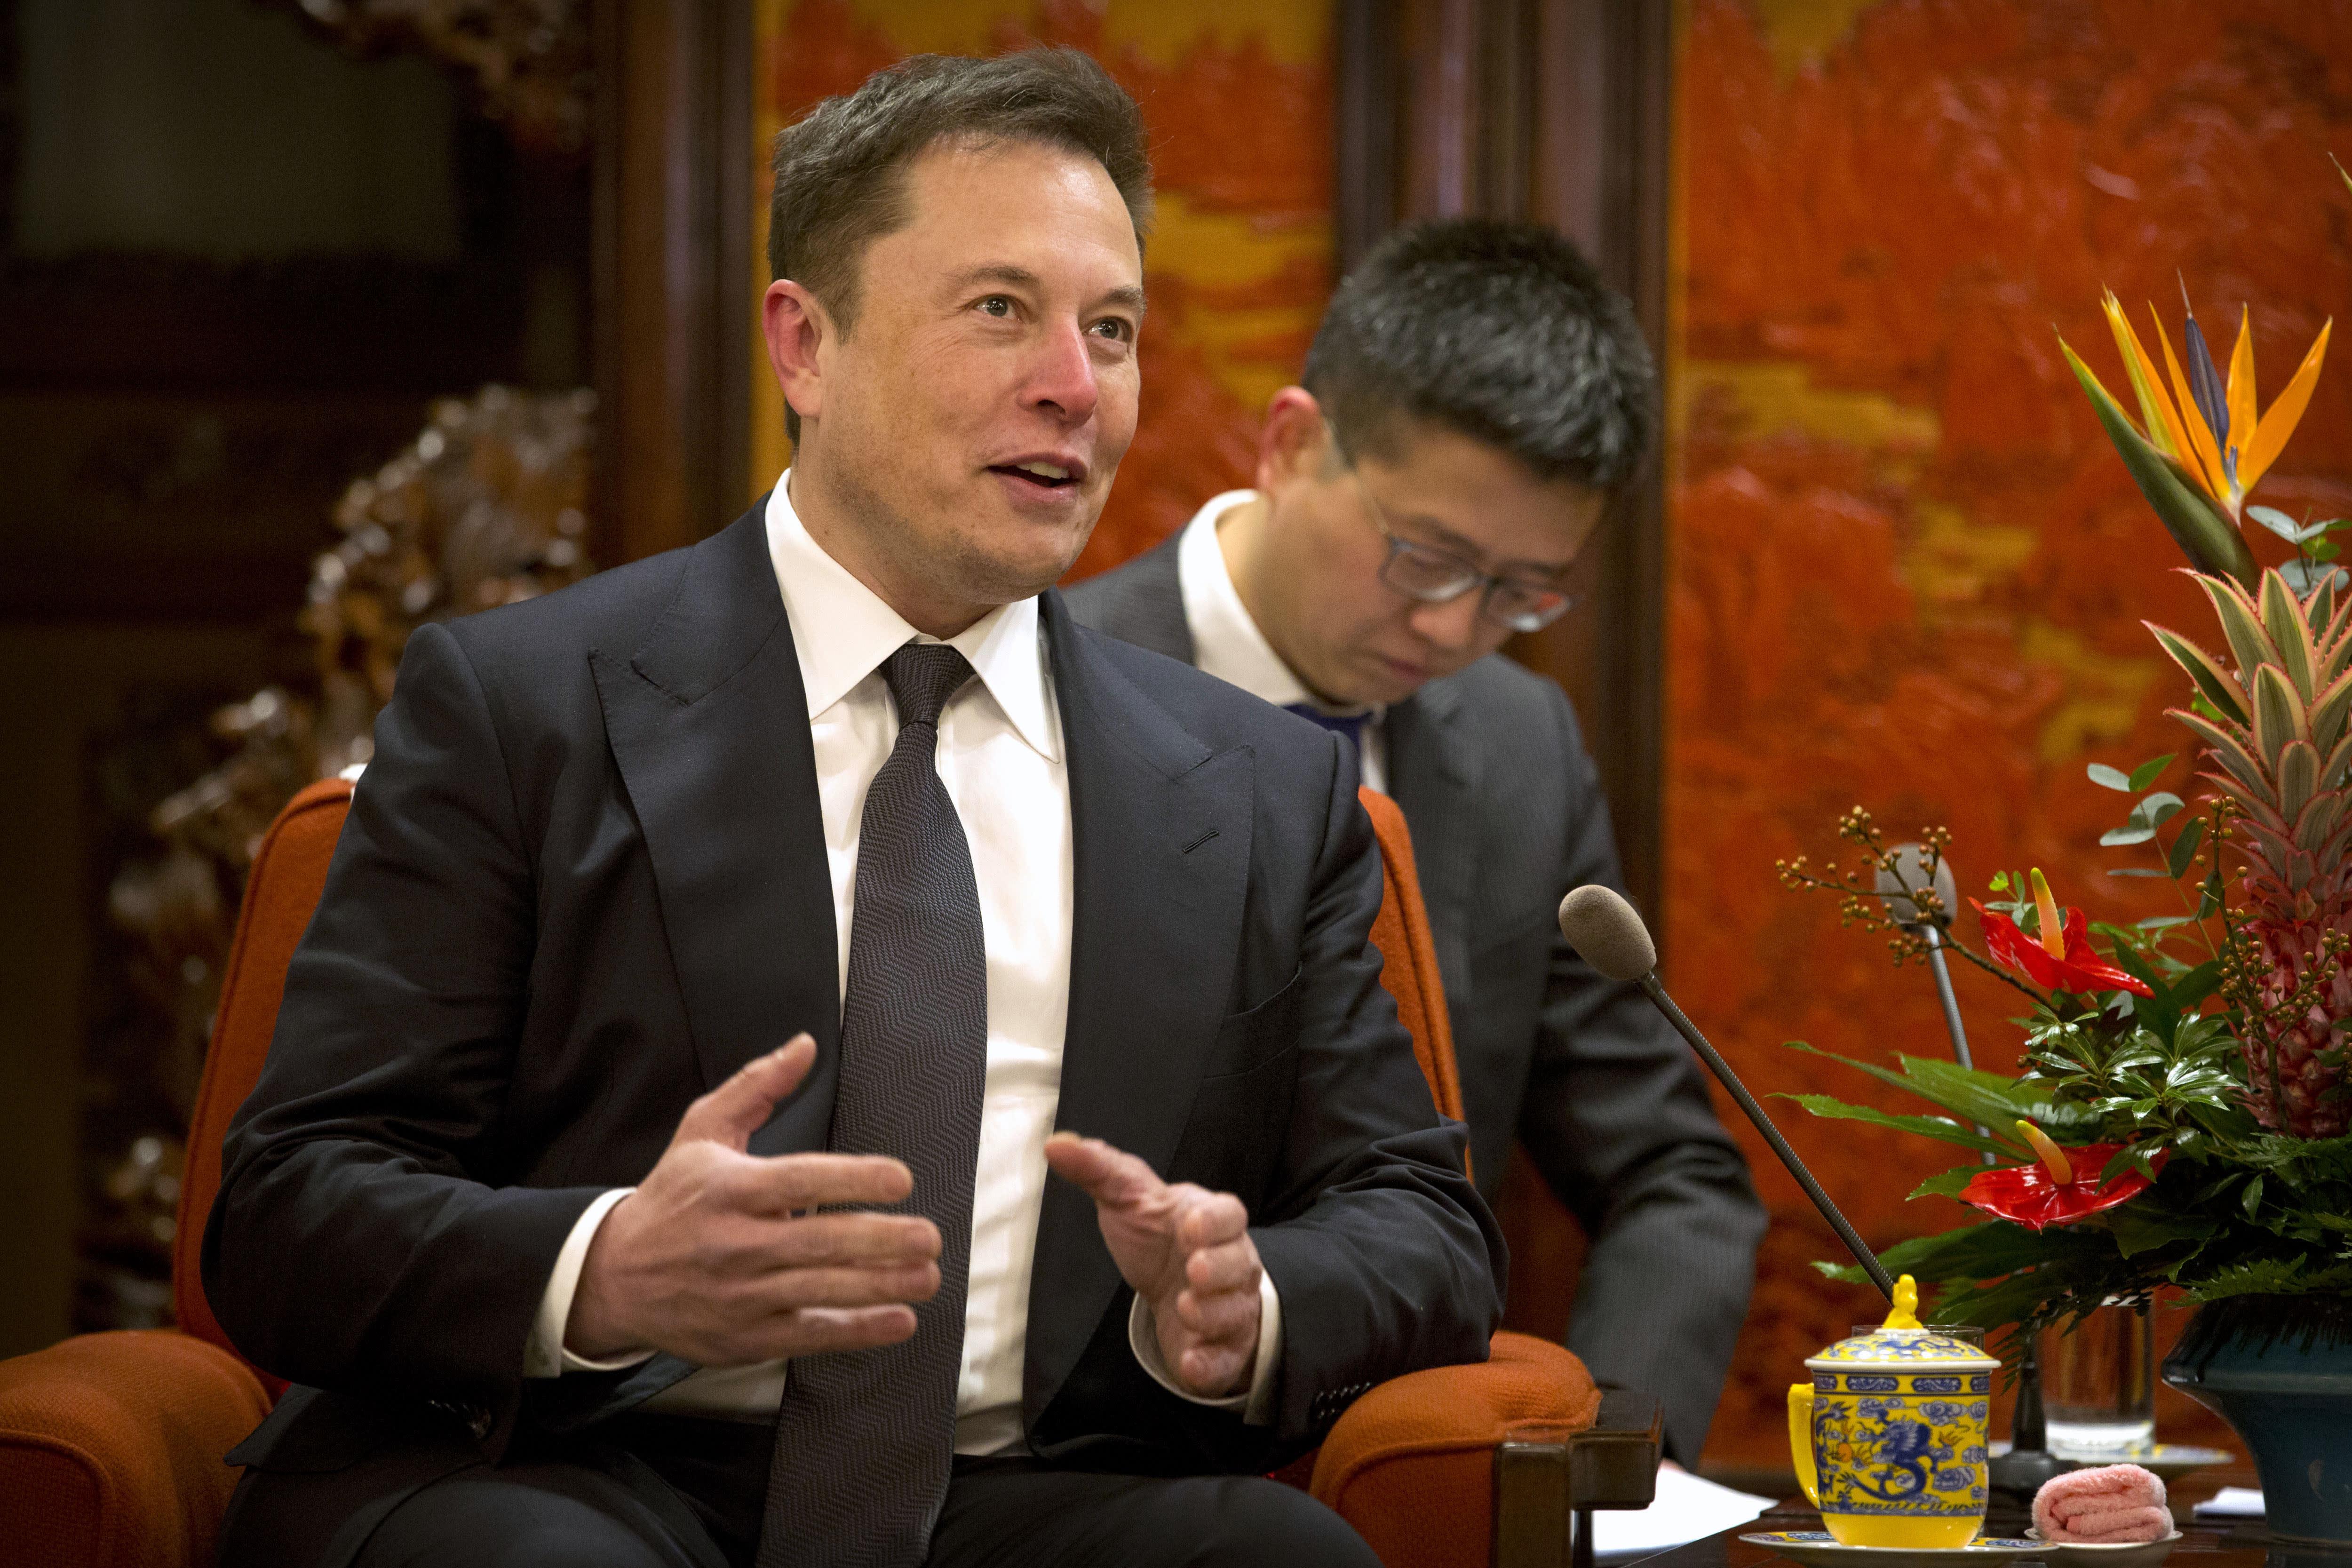 Tesla shares jump 9% amid tech rebound, Goldman comments